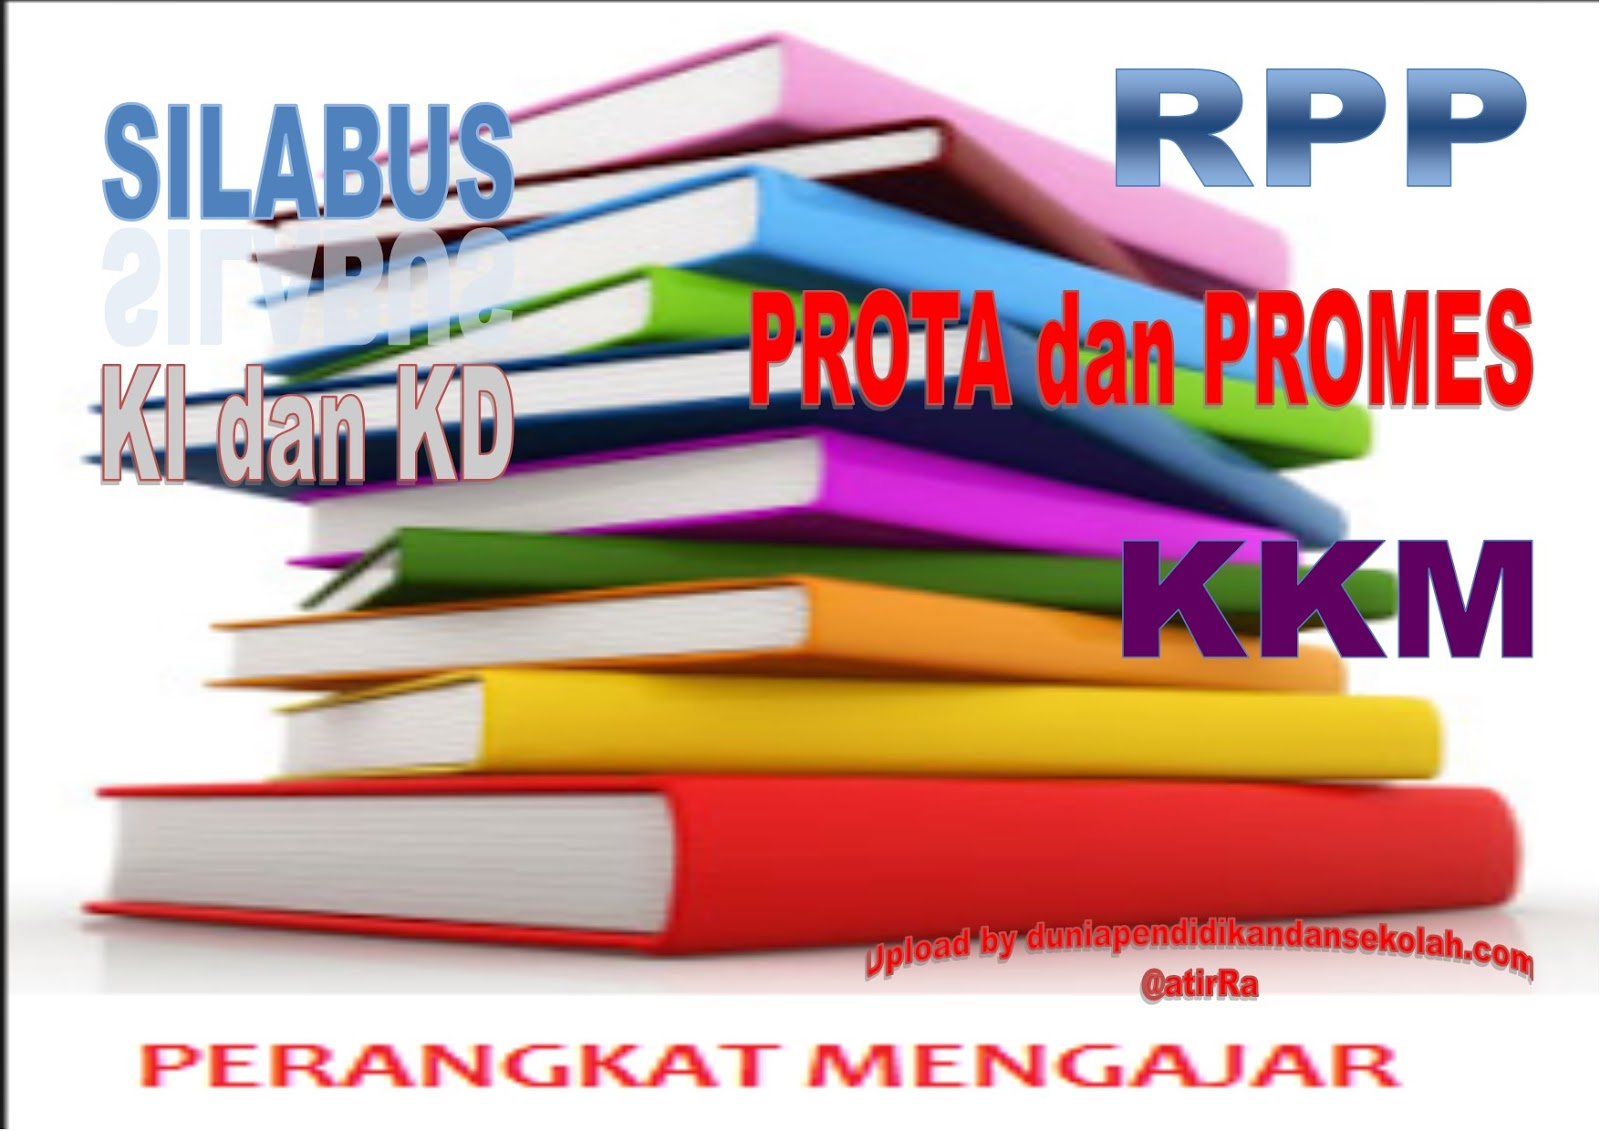 Rpp Kelas 1 Kurikulum 2013 Revisi 2017 Dilengkapi Arsip 2016 Semester 1 Dan 2 Ki Kd Silabus